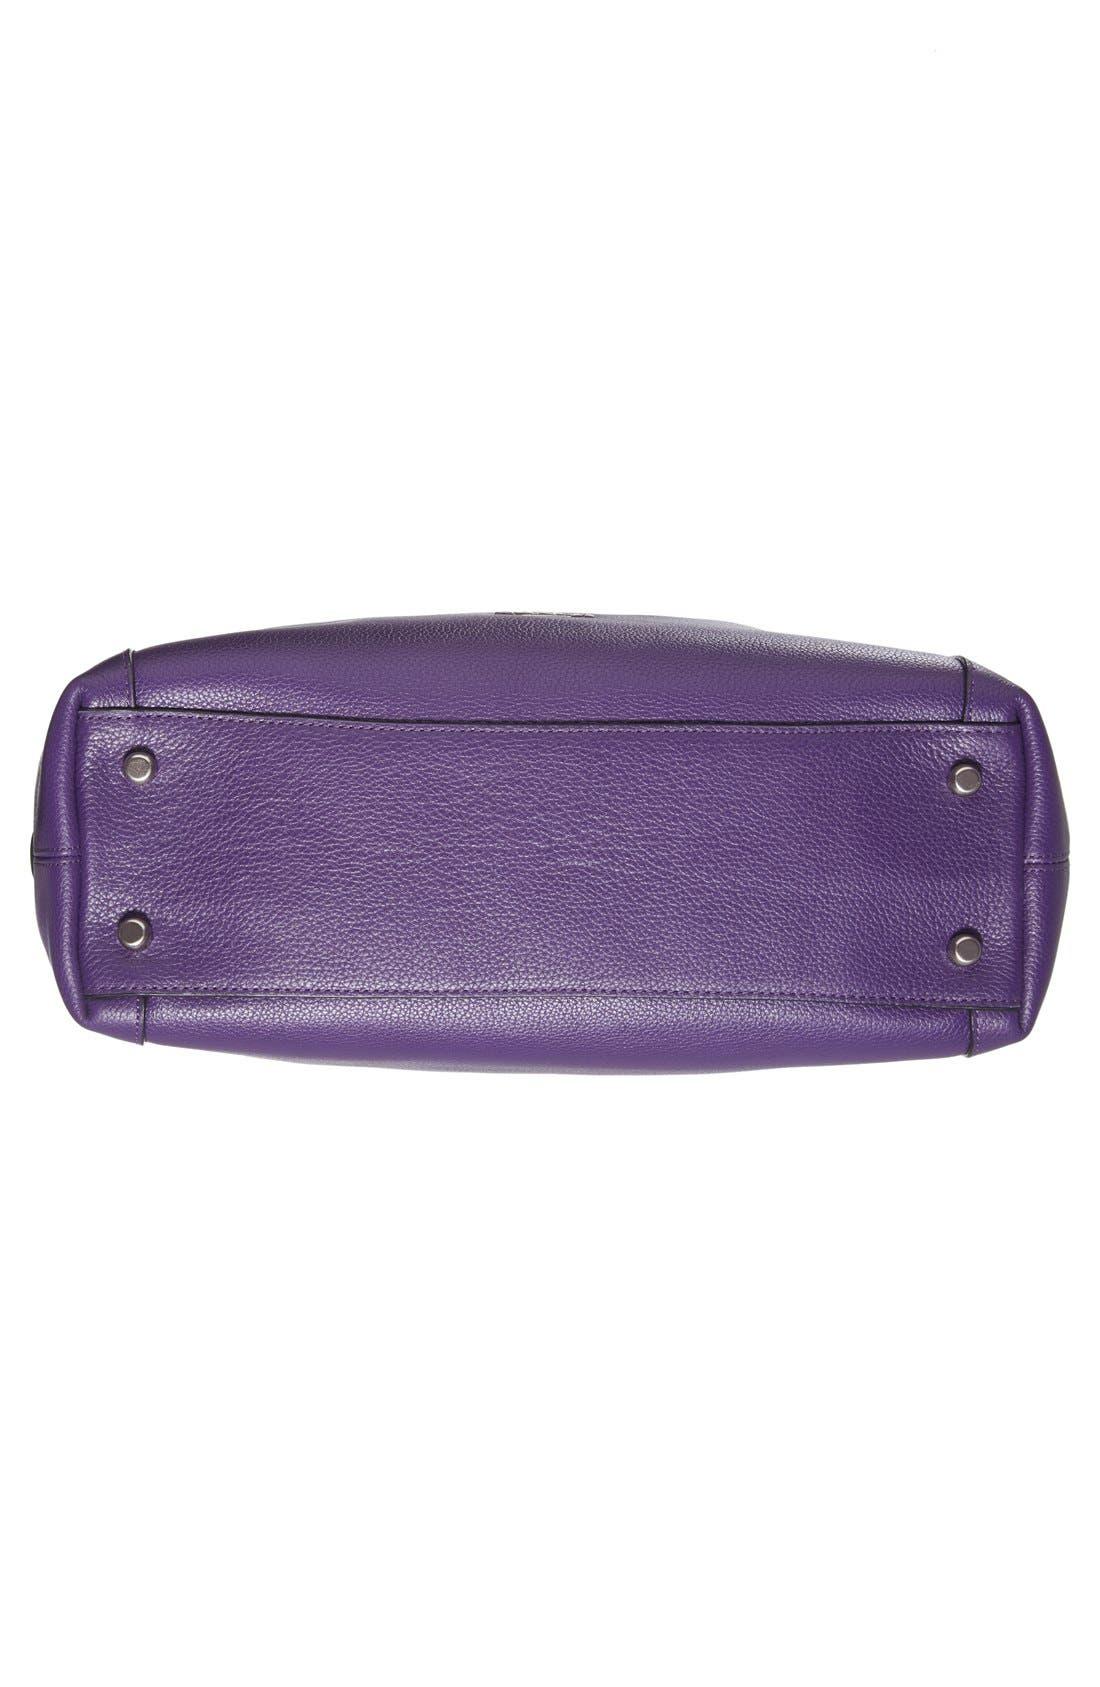 COACH,                             'Edie 31' Pebbled Leather Shoulder Bag,                             Alternate thumbnail 4, color,                             500